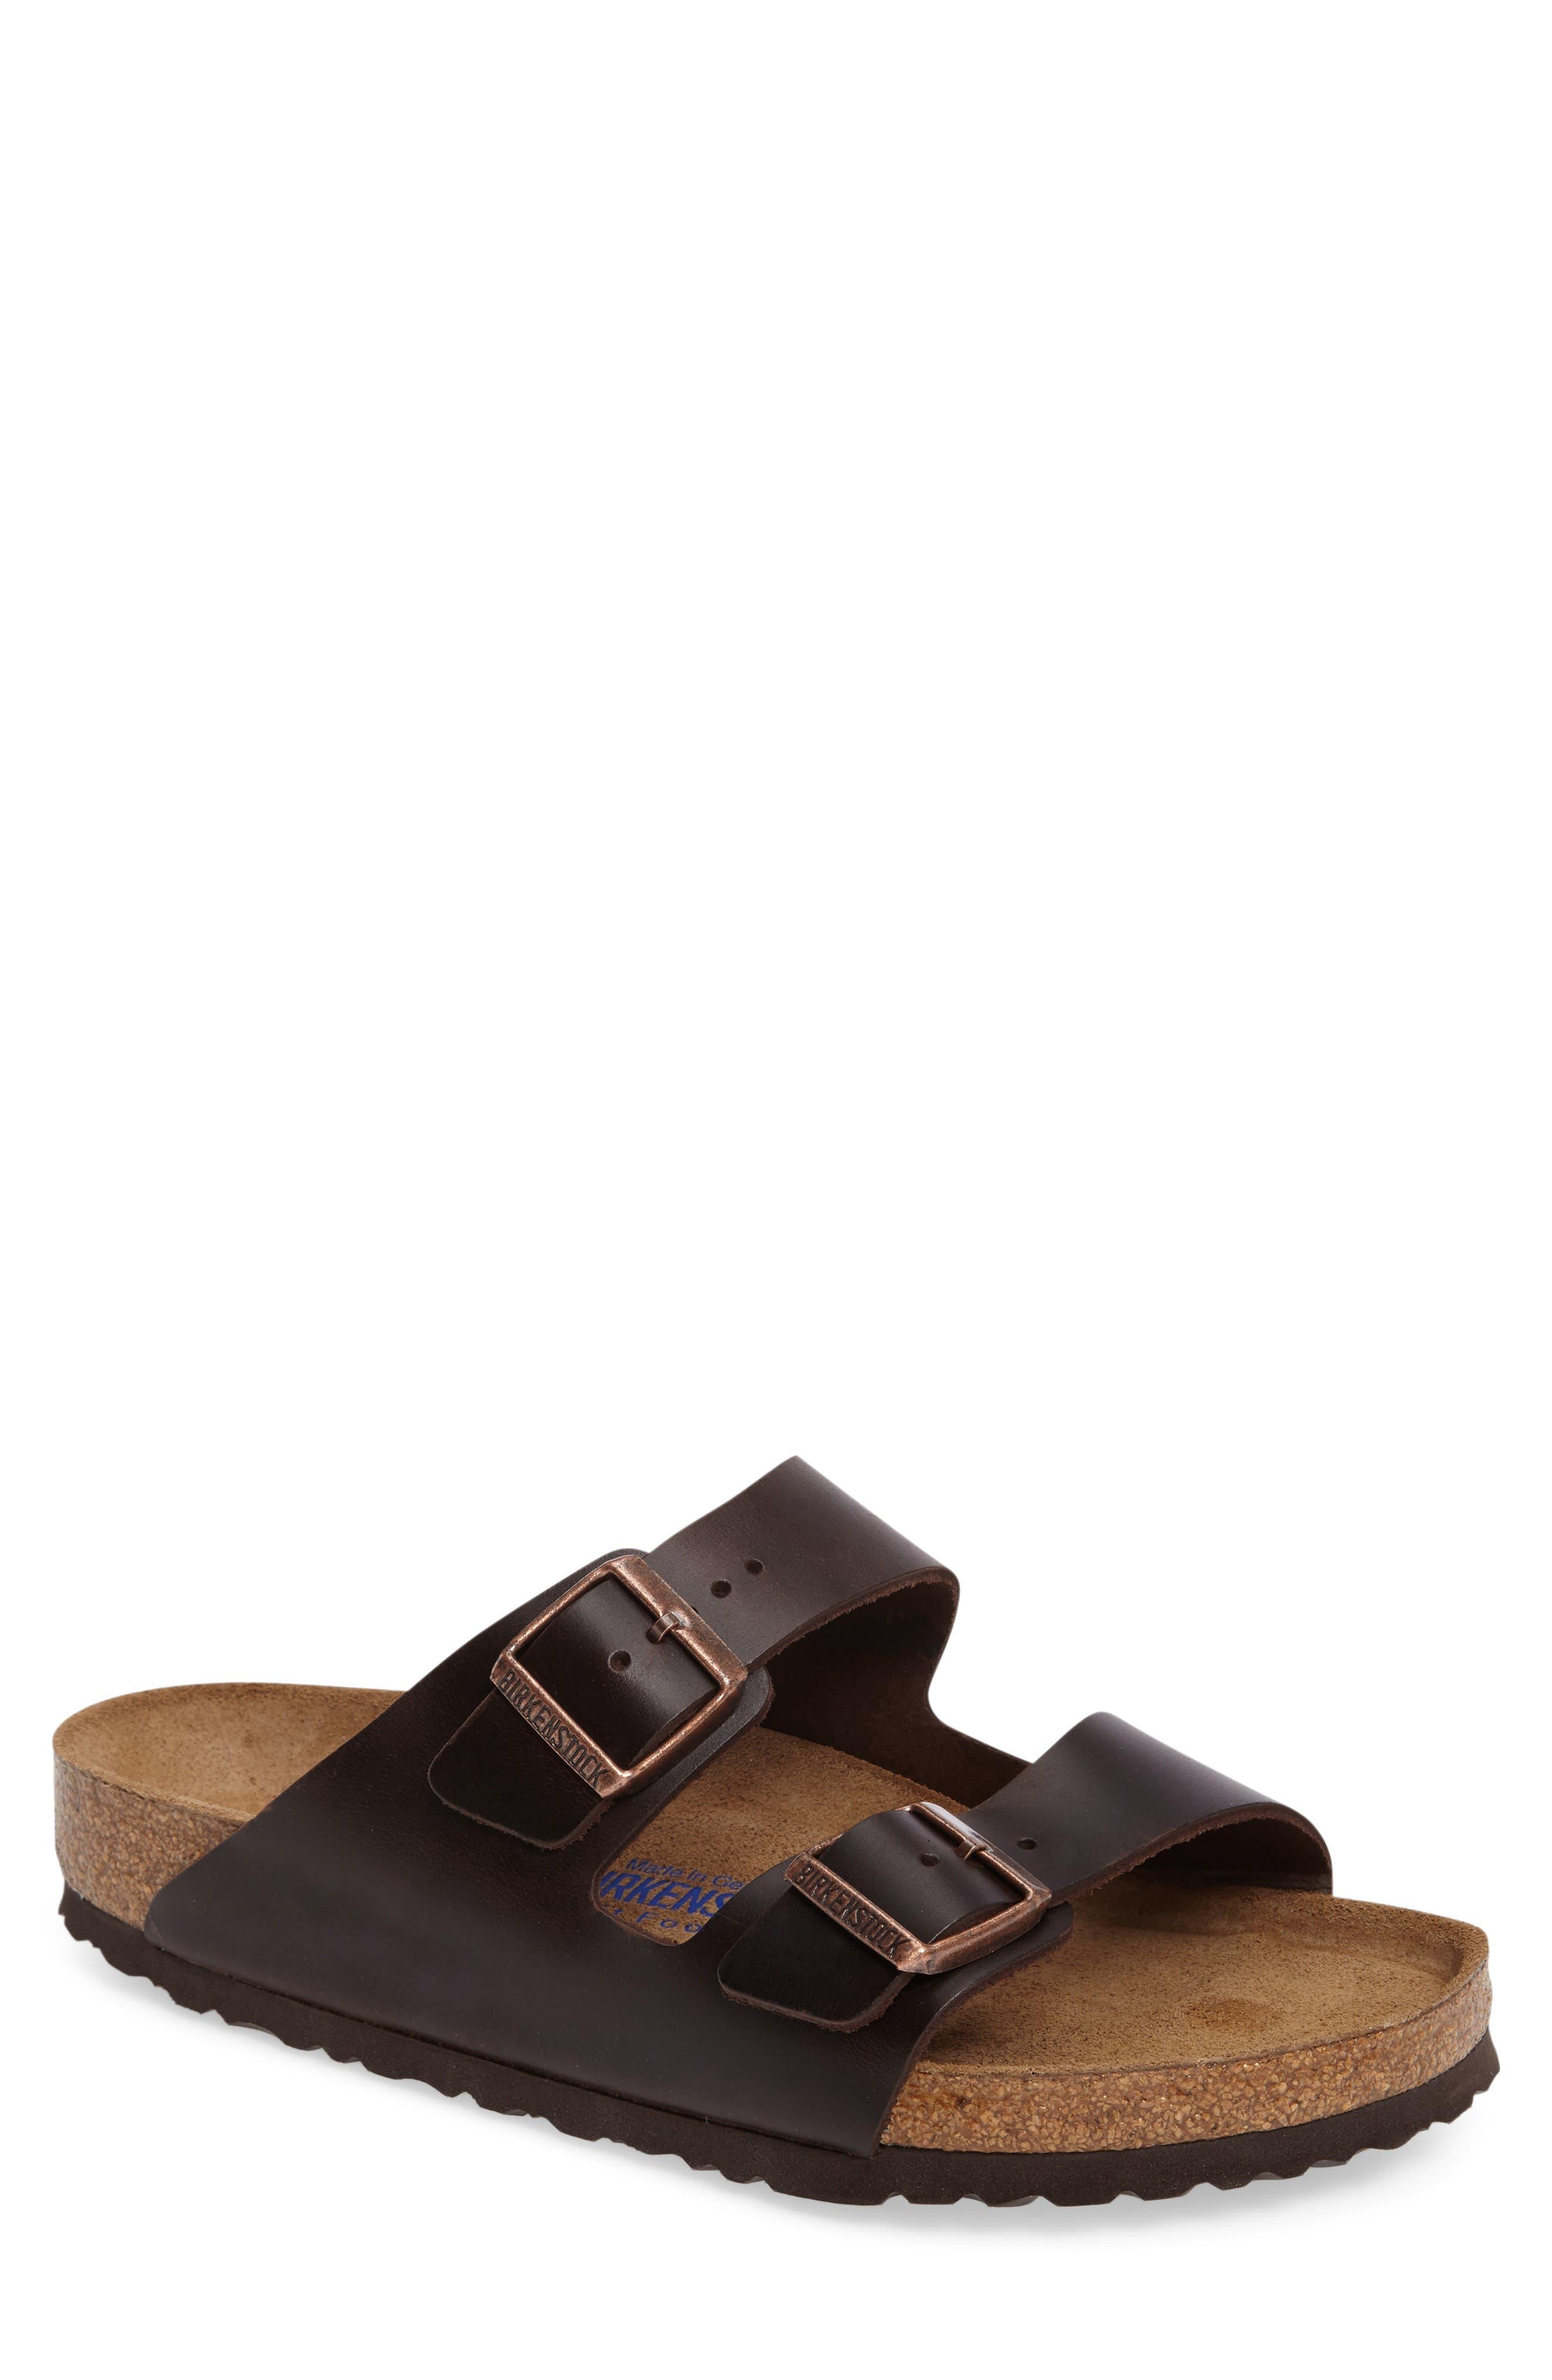 'Arizona Soft' Sandal,                         Main,                         color, BROWN